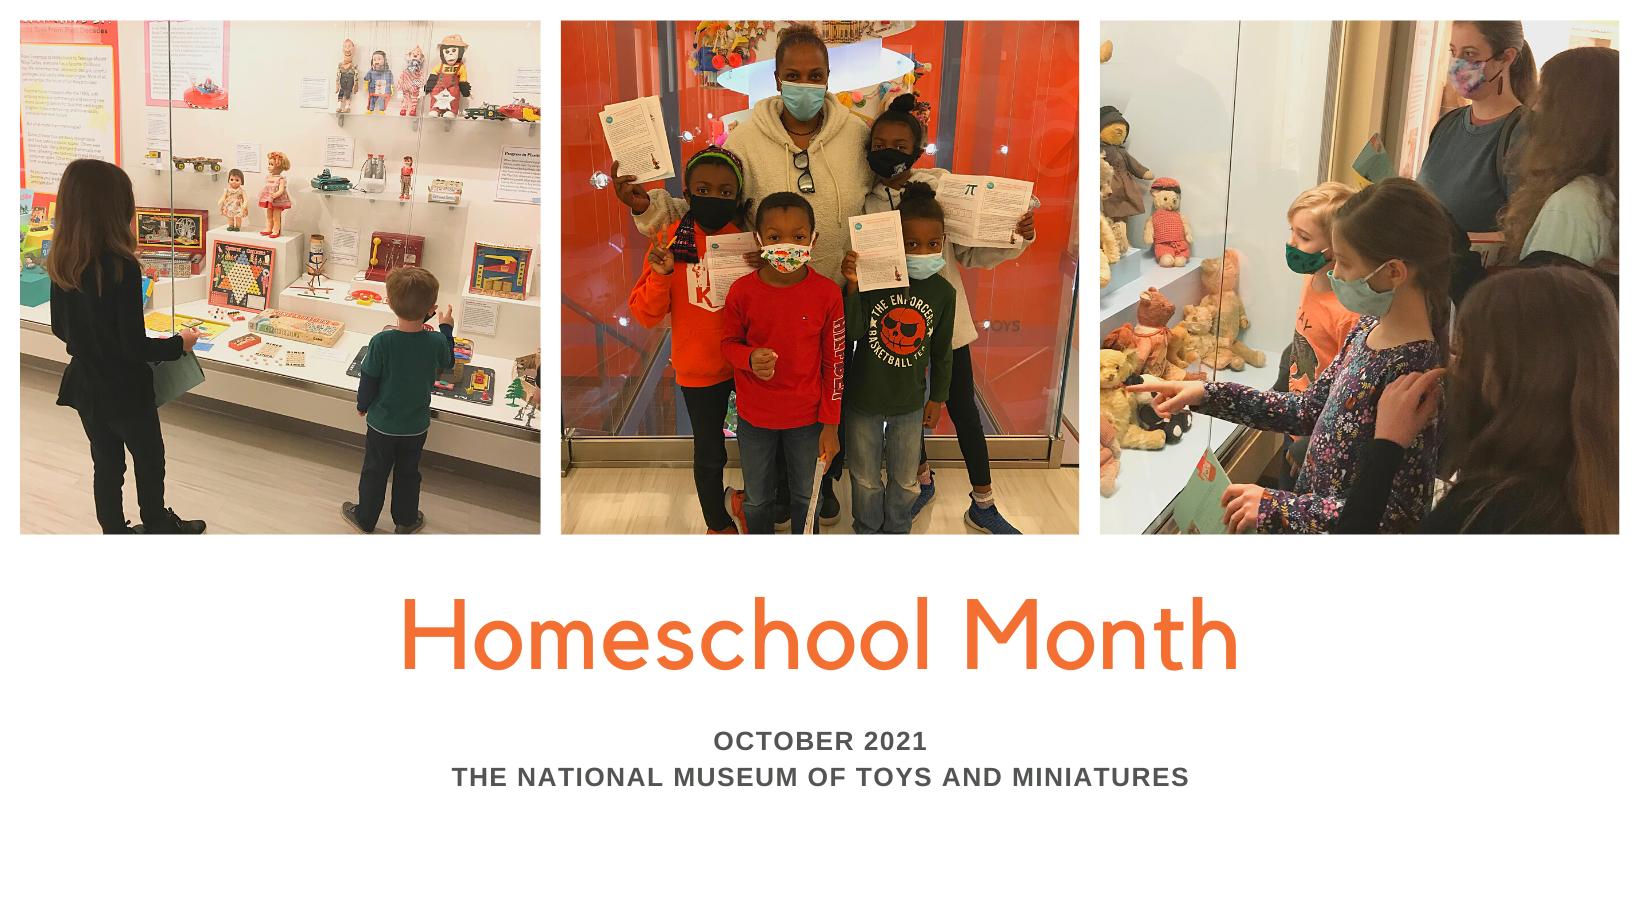 Homeschool Month 2021 graphic